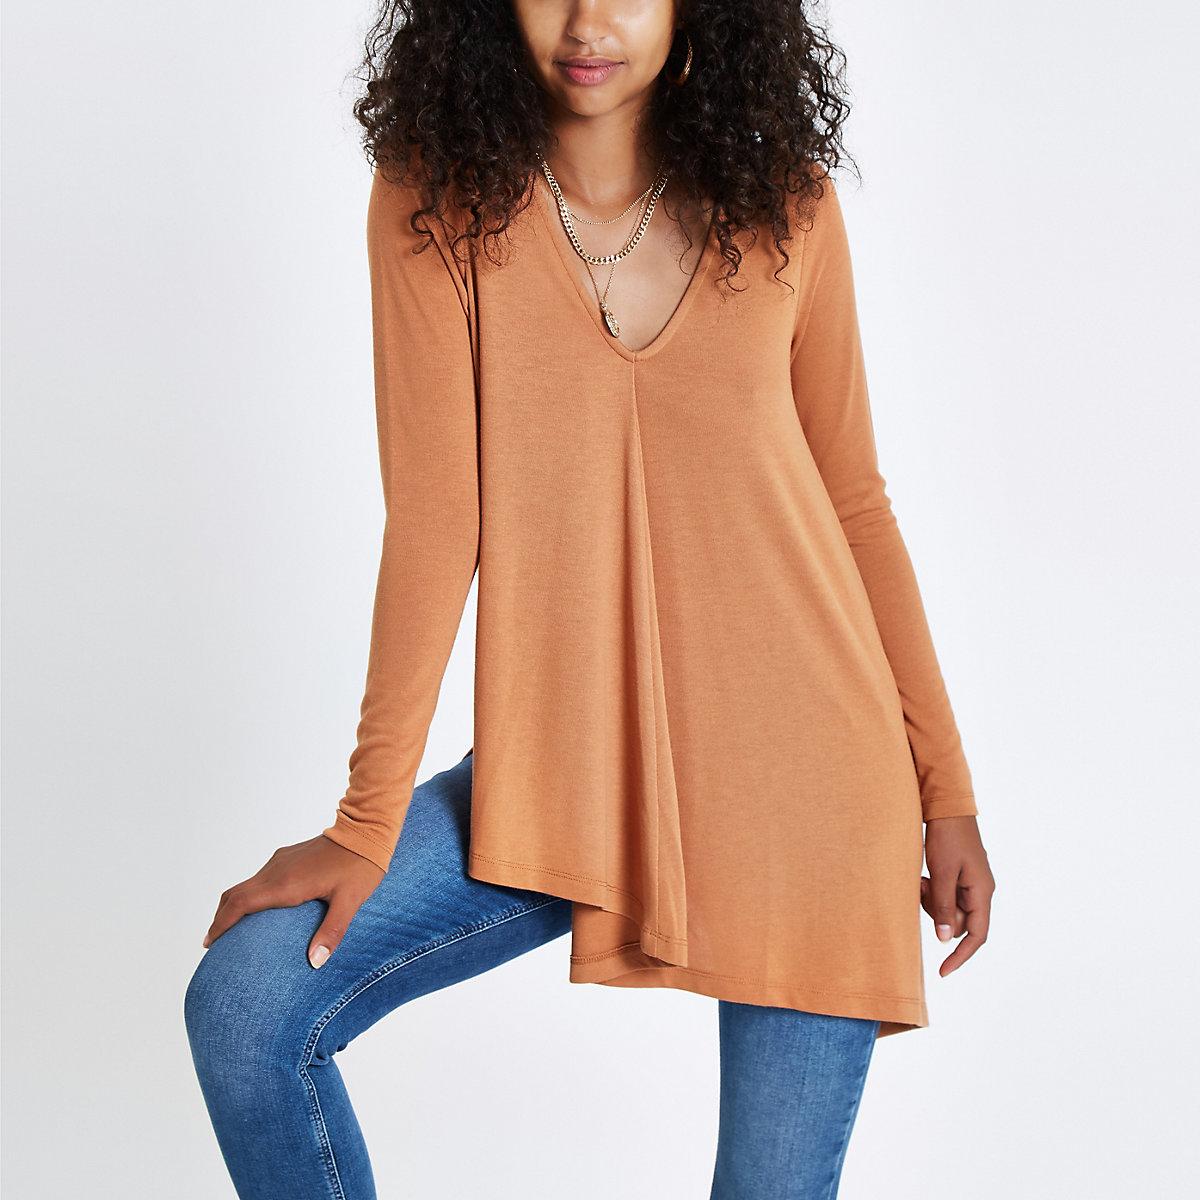 Light brown long sleeve drape top